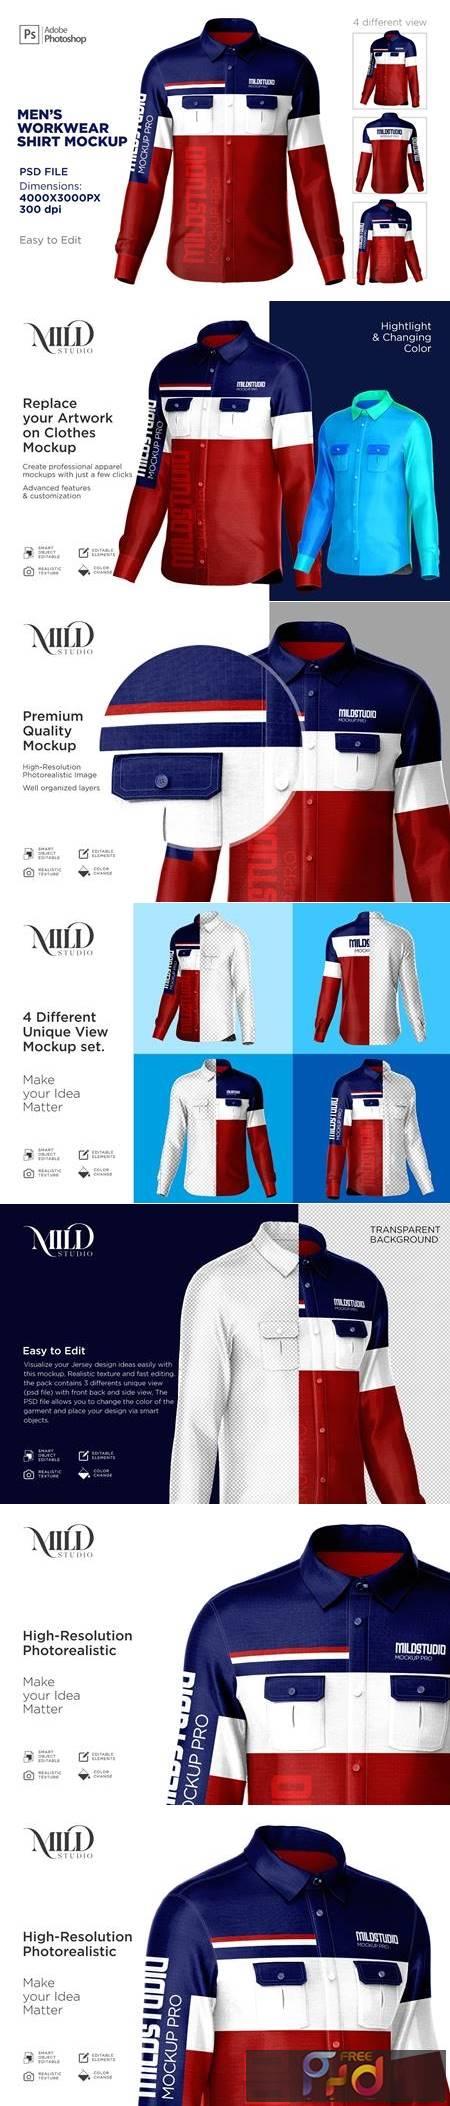 Mens workwear shirt set mockup 6359632 1